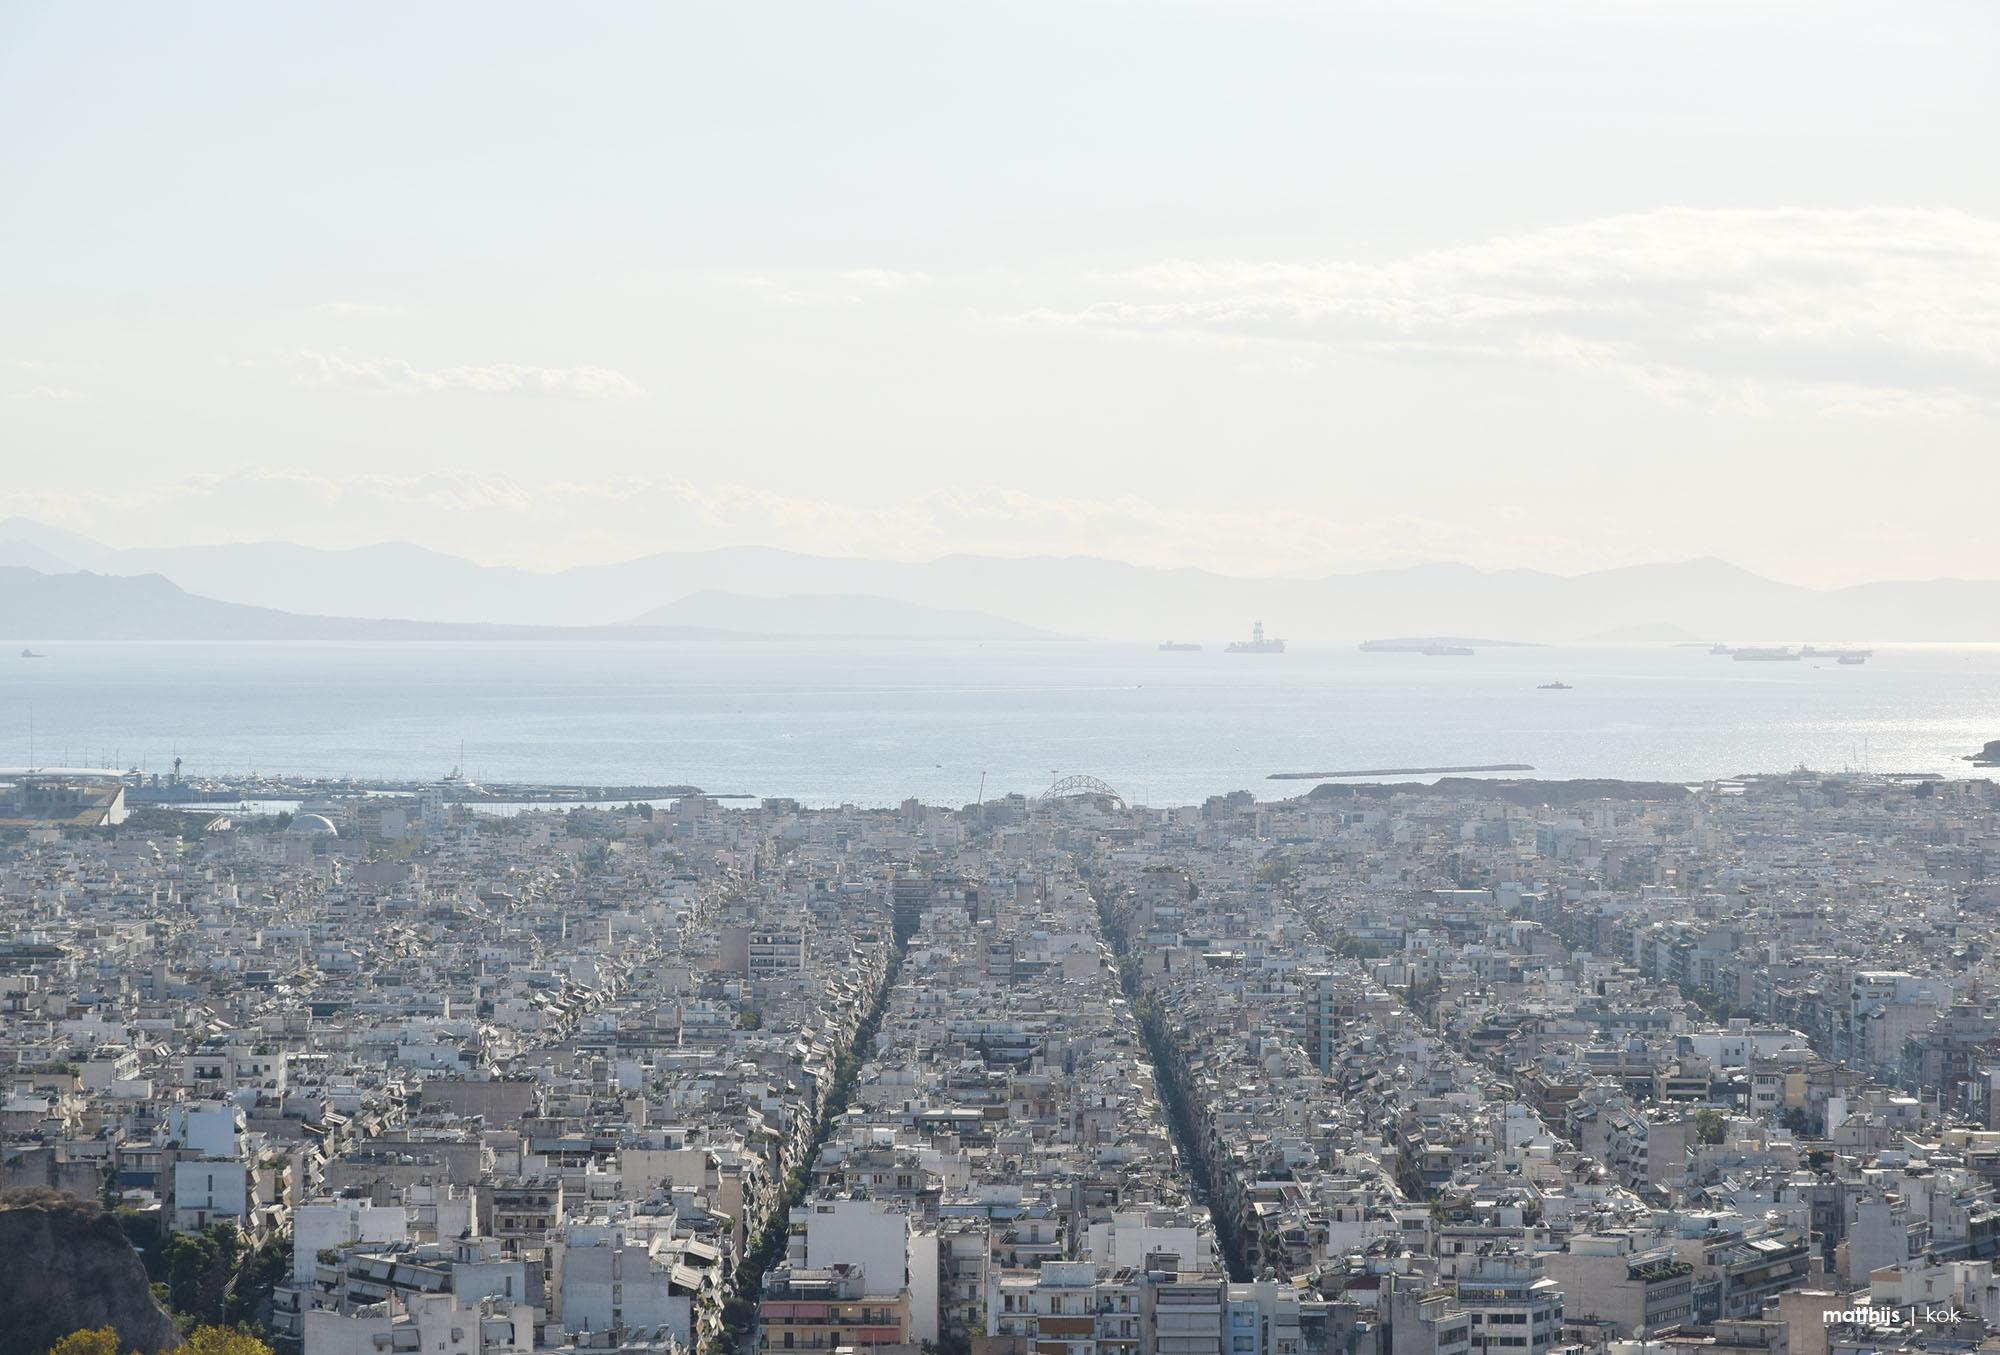 Athens, Greece | Photo by Matthijs Kok